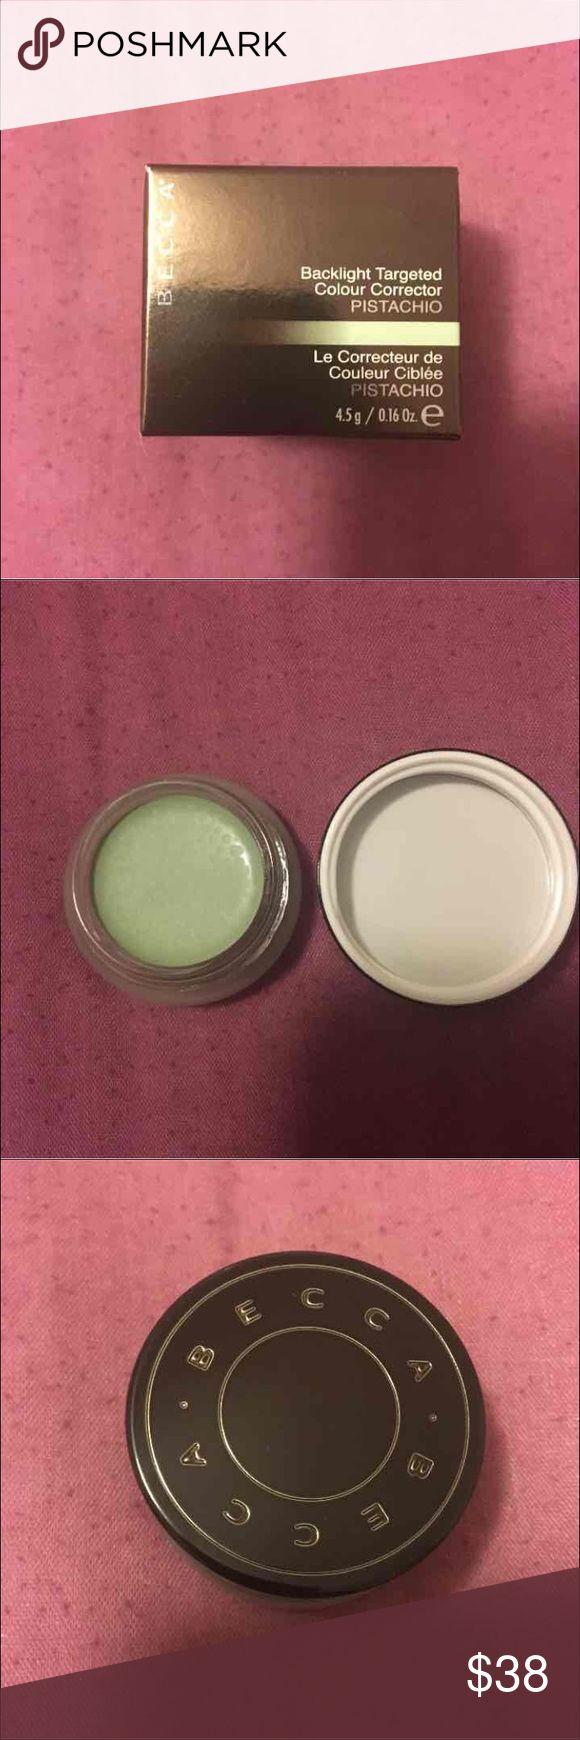 Becca Colour Corrector Pistachio Brand new in box. Corrects redness. BECCA Makeup